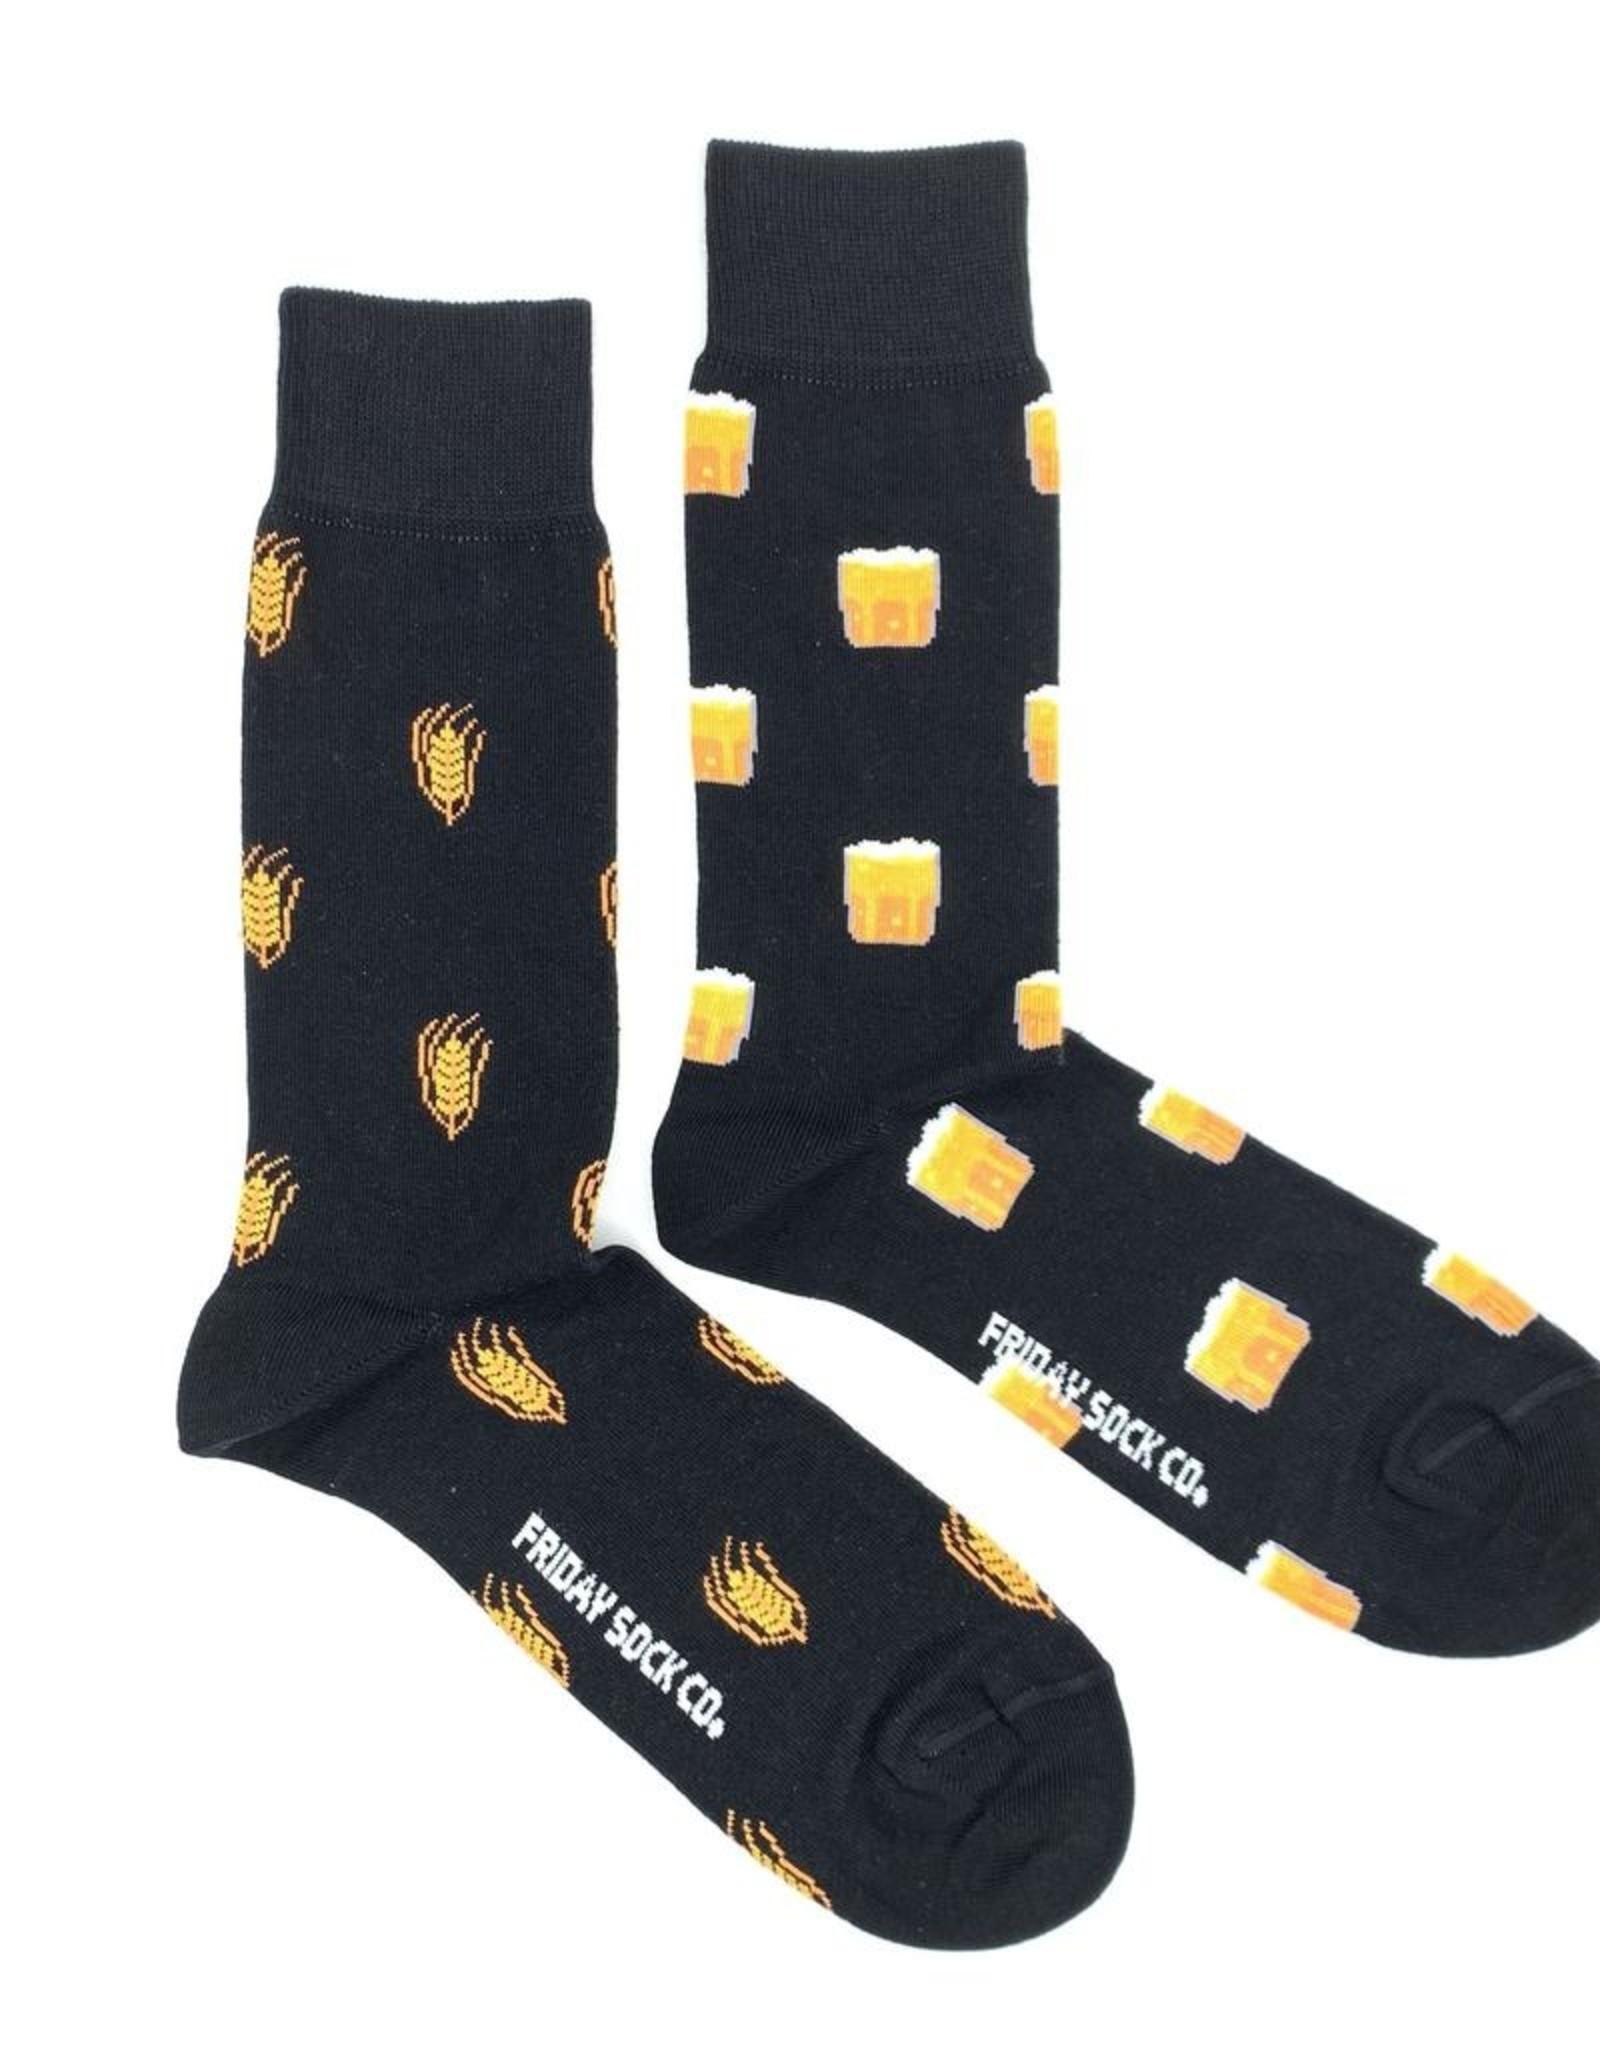 Beer & Barley Socks